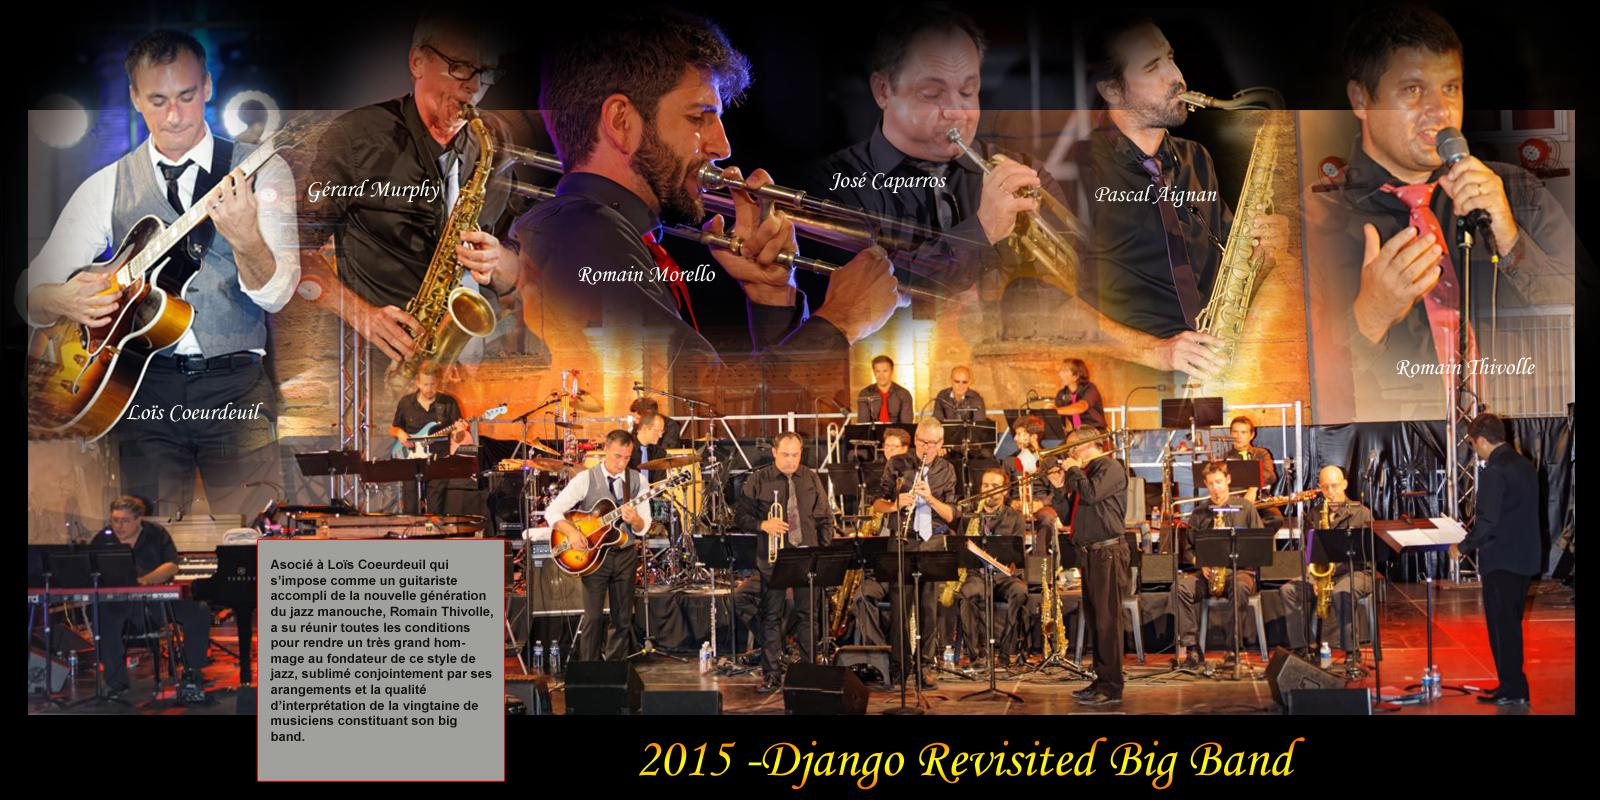 2015-DjangoBB (1600x800)